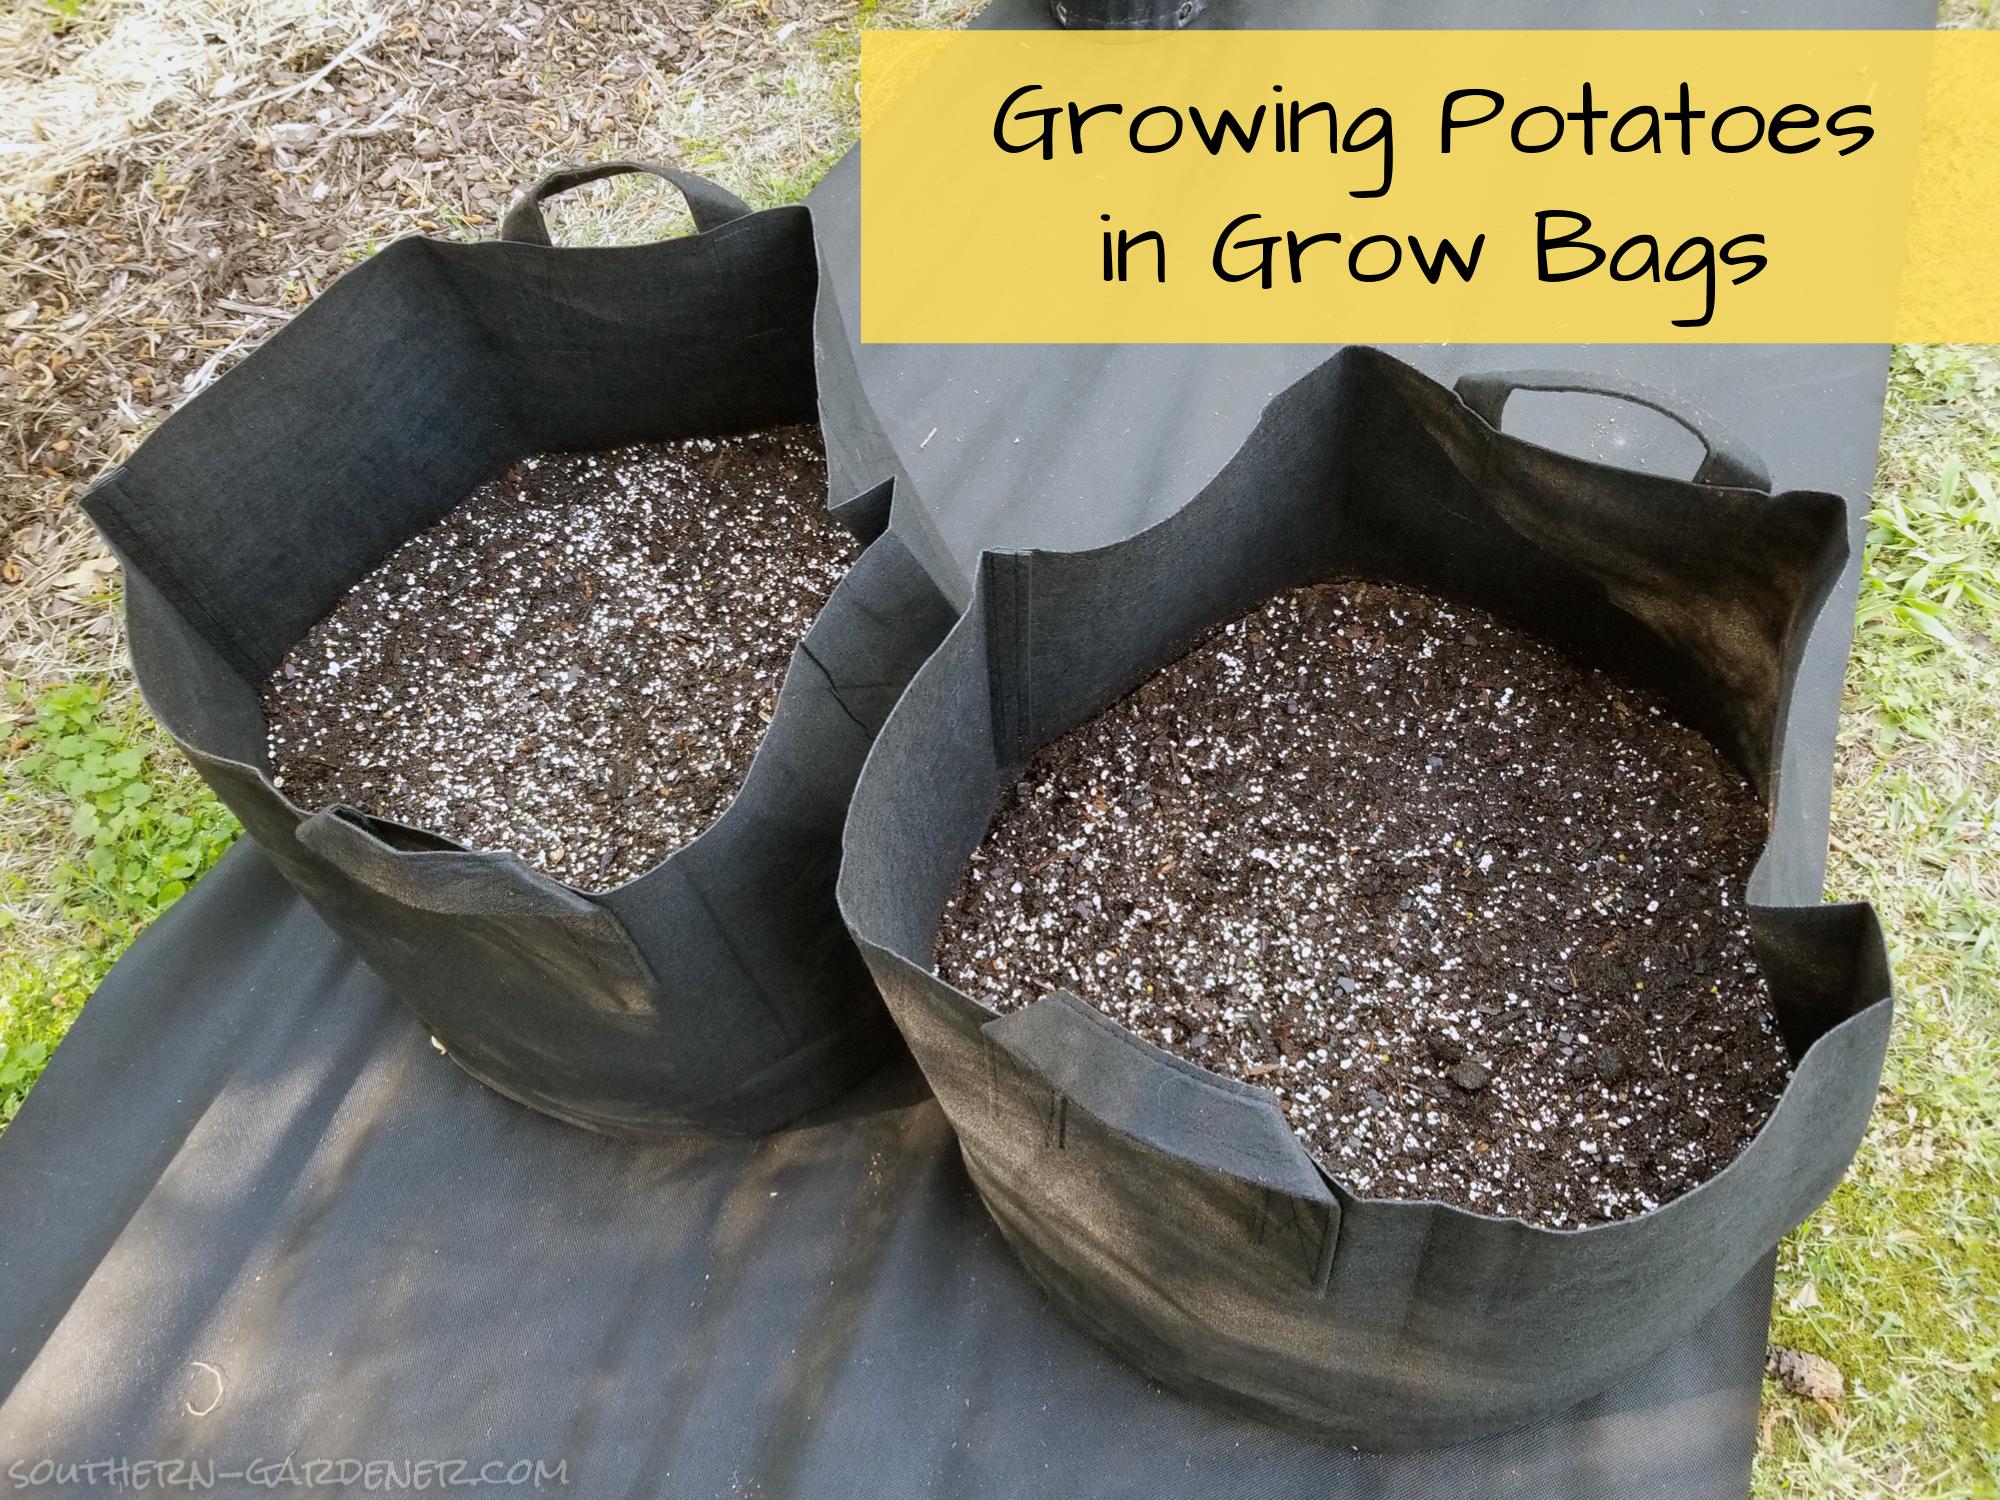 Growing Potatoes in Grow Bags